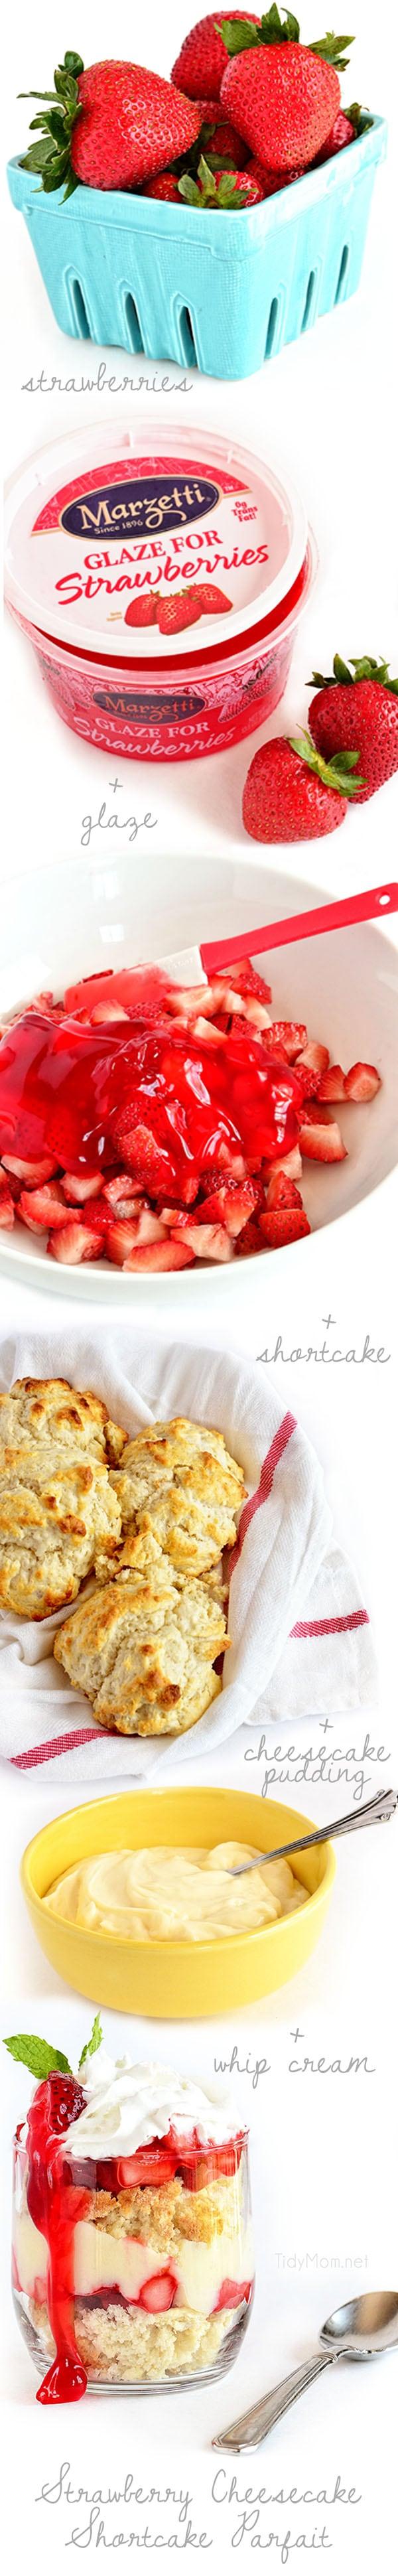 How to make Strawberry Cheesecake Shortcake Parfait recipe at TidyMom.net